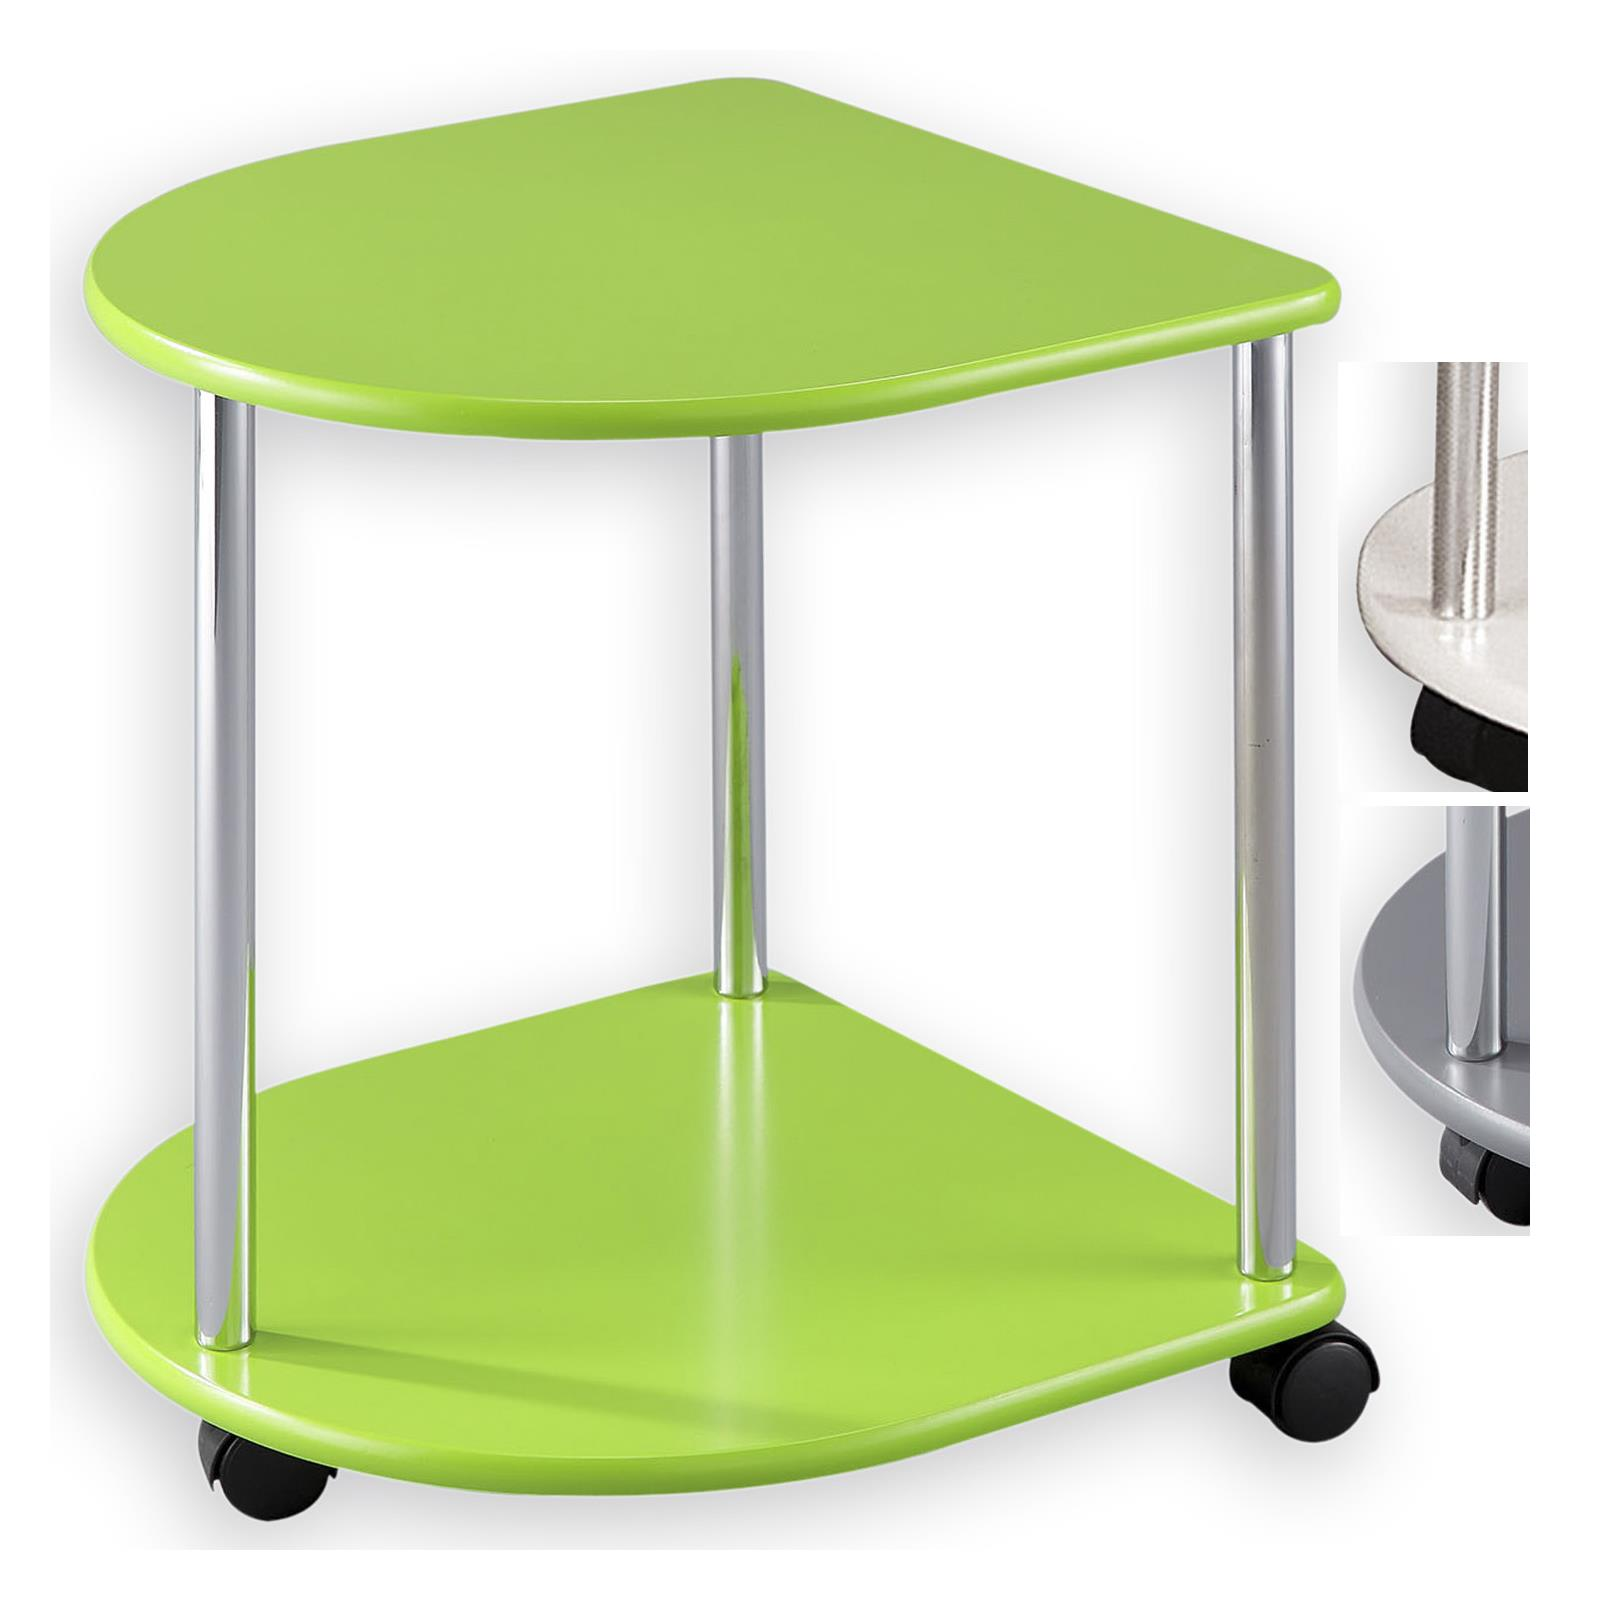 couchtisch felina mit rollen in 3 farben mobilia24. Black Bedroom Furniture Sets. Home Design Ideas